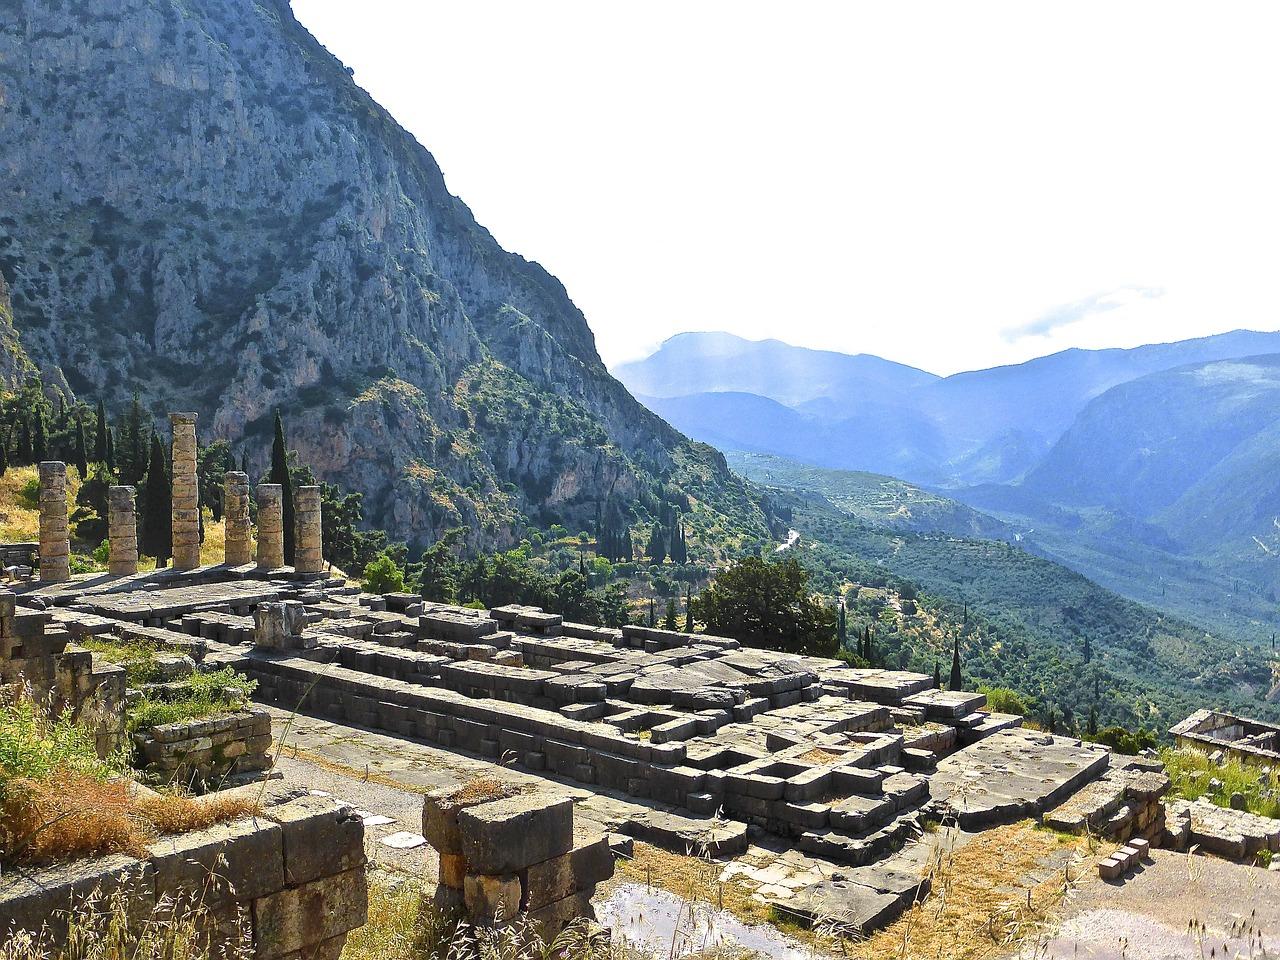 Tempelruine von Delphi